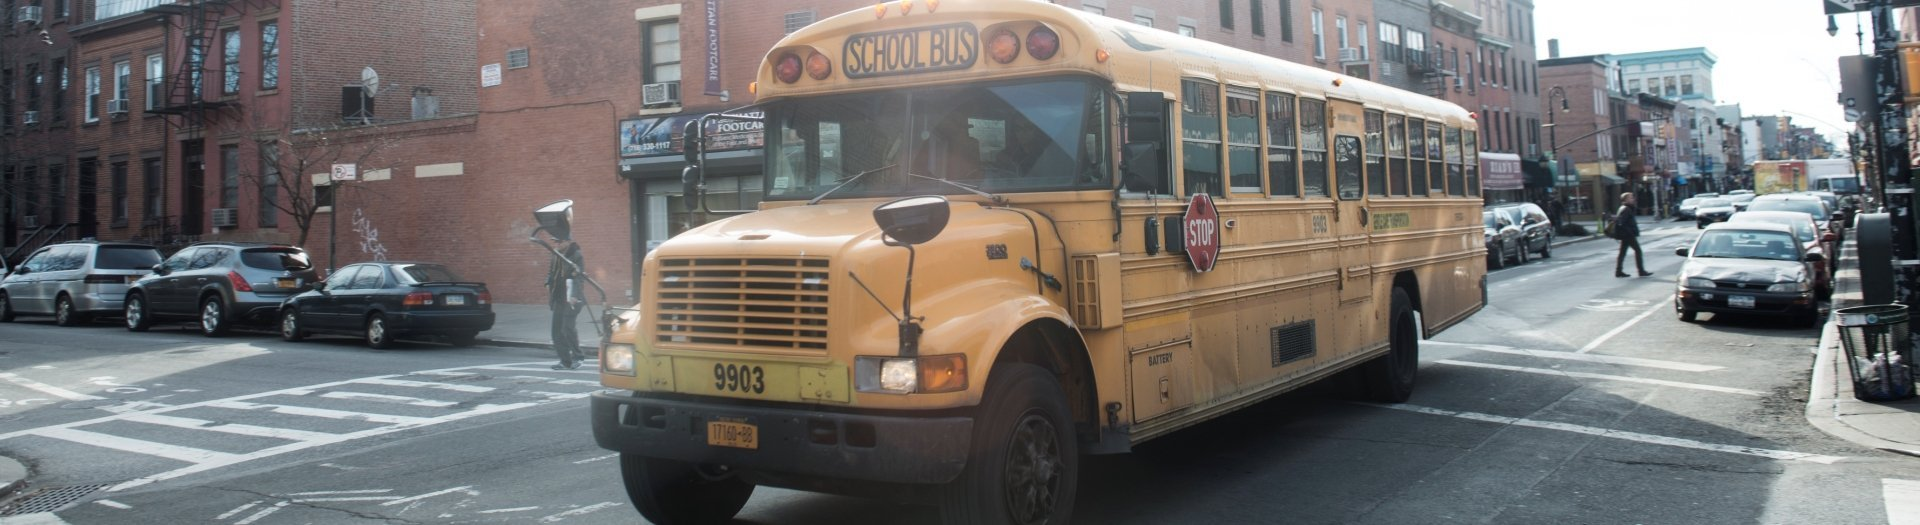 NY_schoolbus